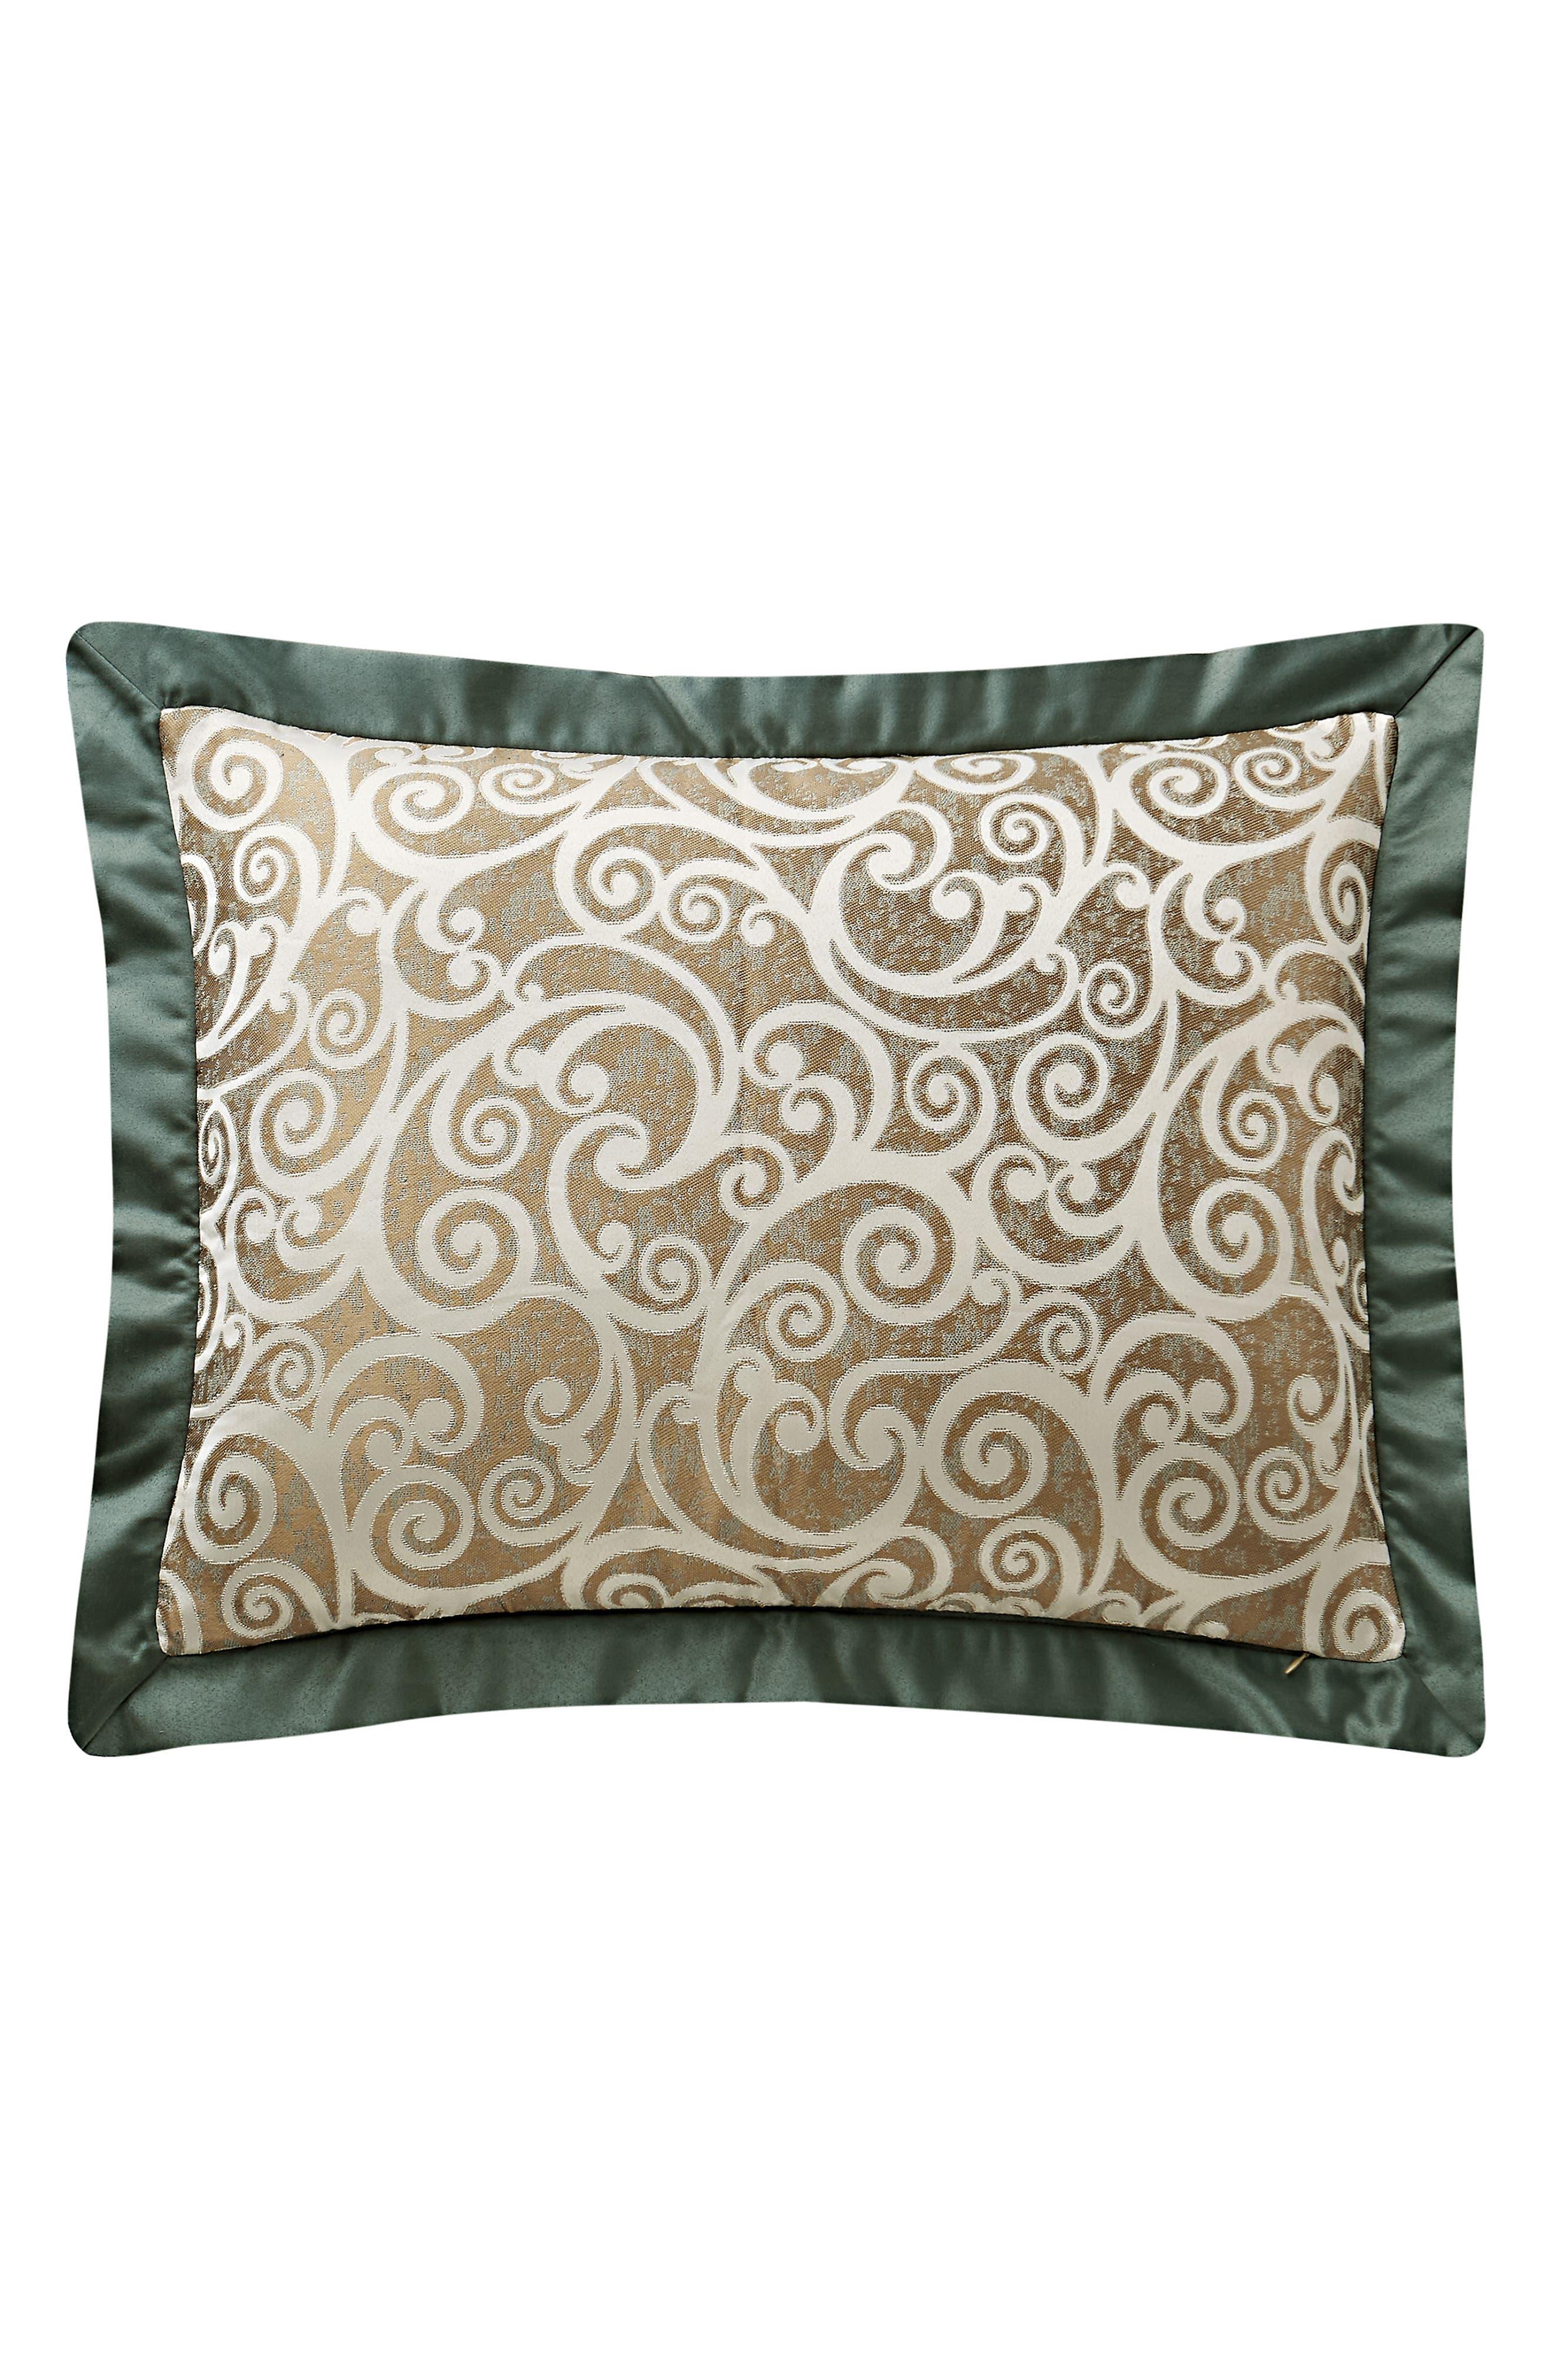 WATERFORD, Anora Comforter, Sham & Bed Skirt Set, Alternate thumbnail 5, color, BRASS/ JADE